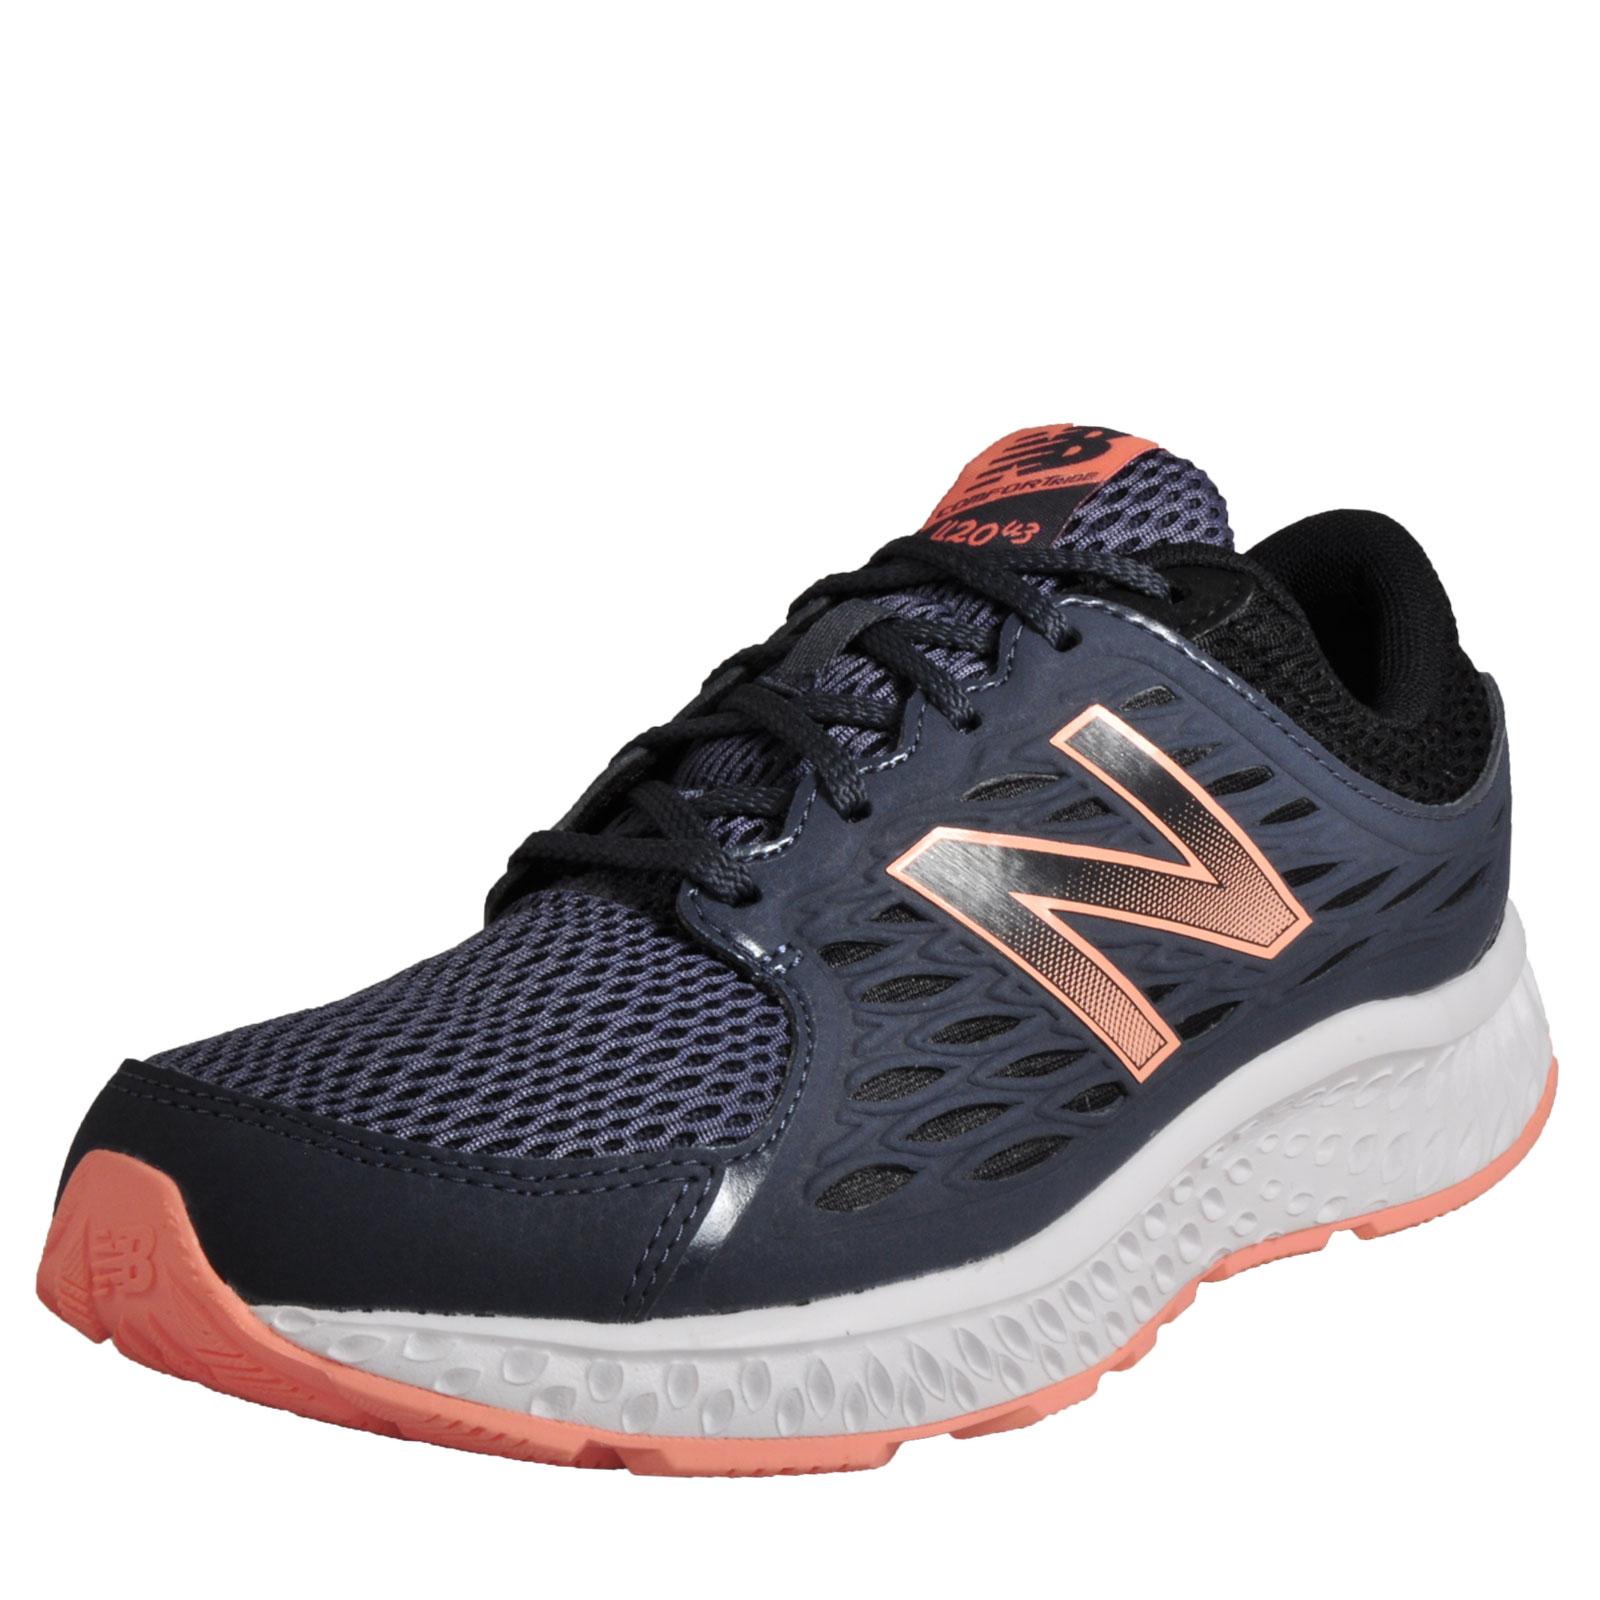 Womens 490v4 Fitness Shoes, Blue (Navy), 4.5 UK 37 EU New Balance